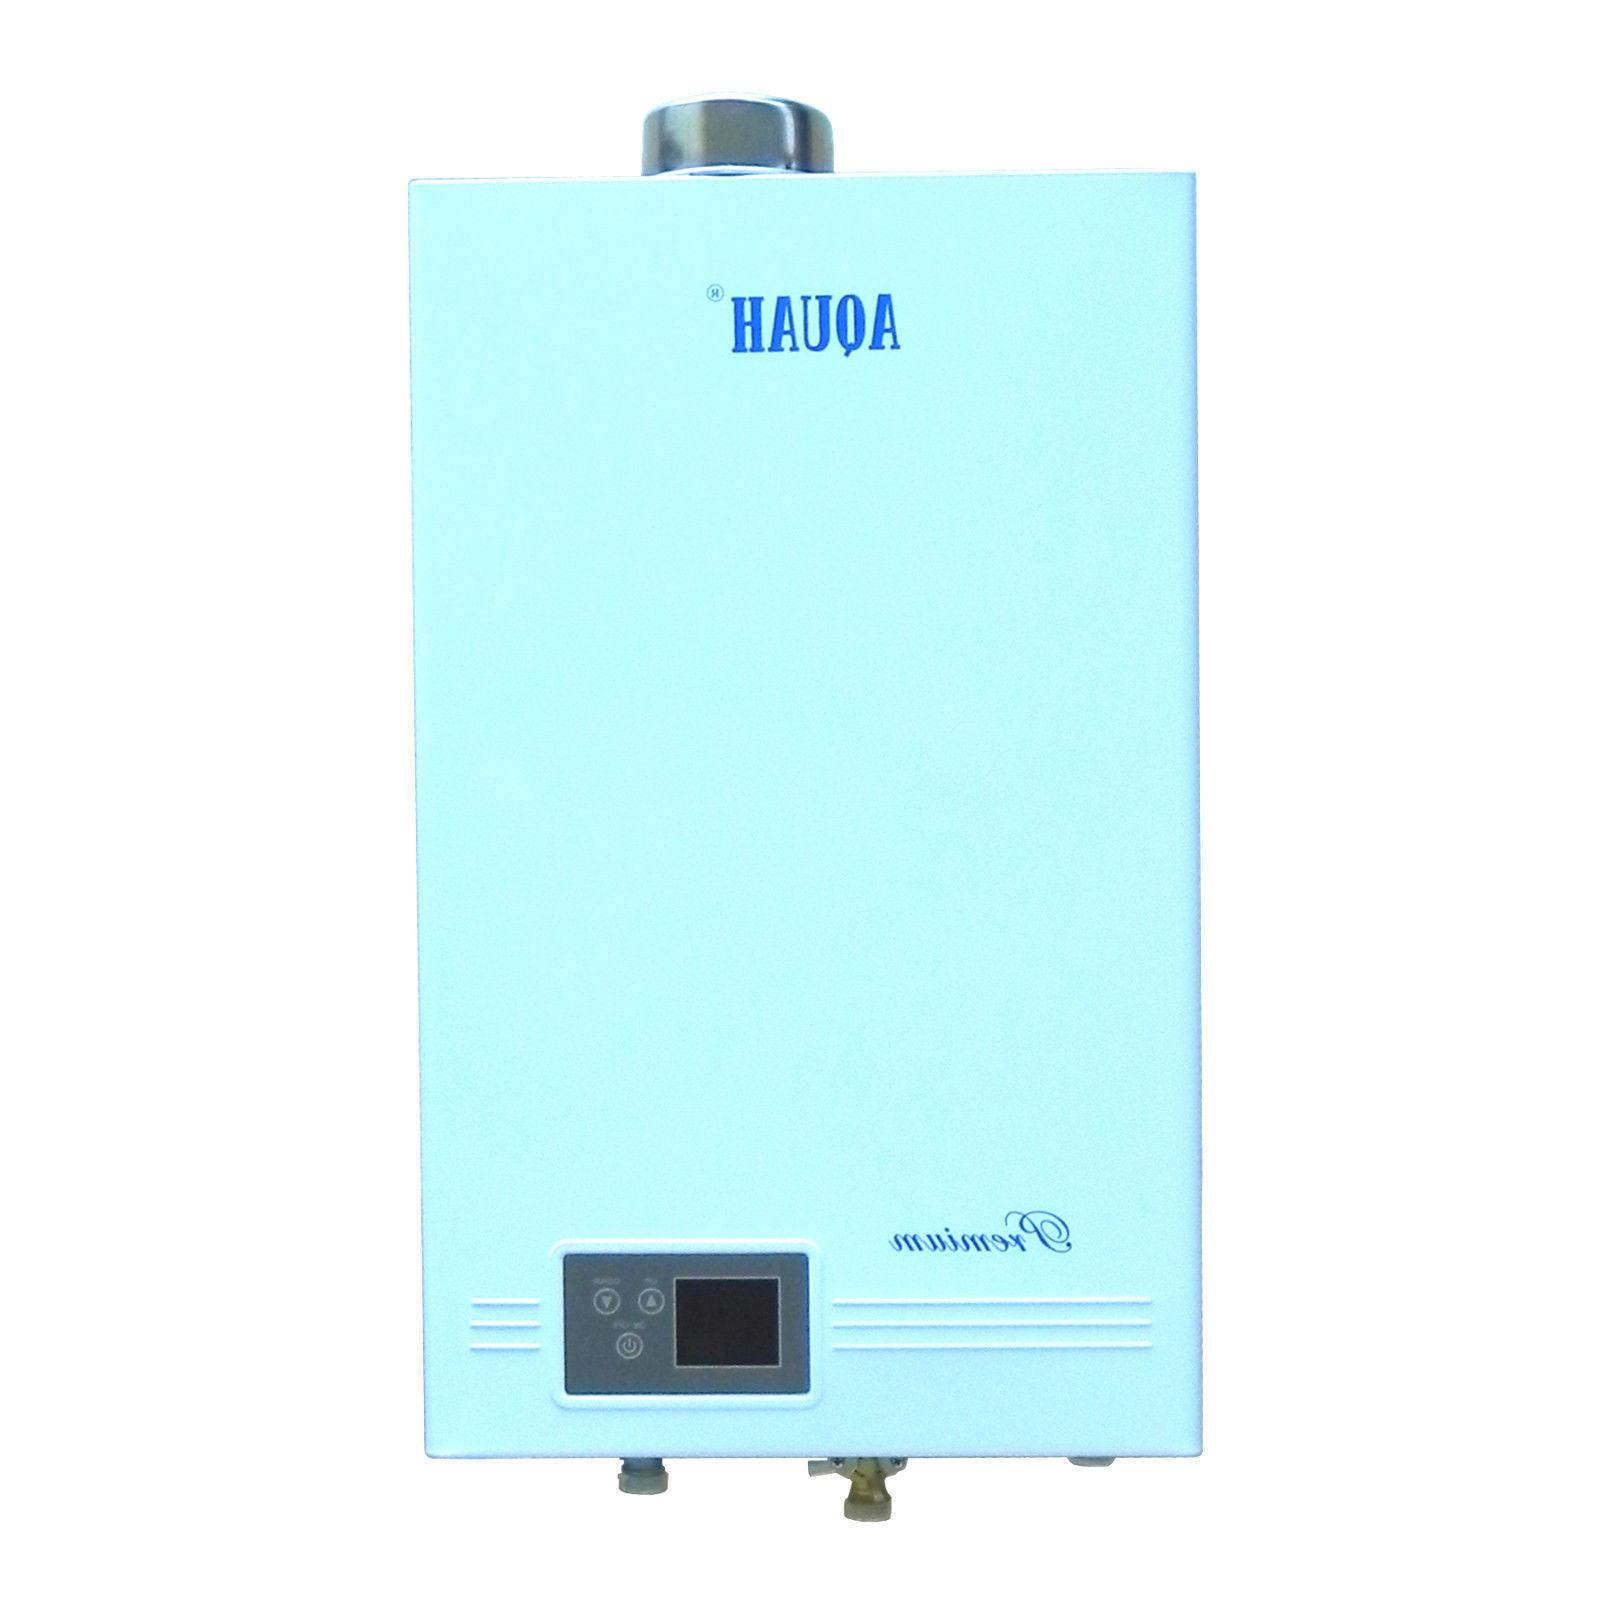 AQUAH DIRECT LIQUID PROPANE WATER HEATER 14L 3.7 GPM